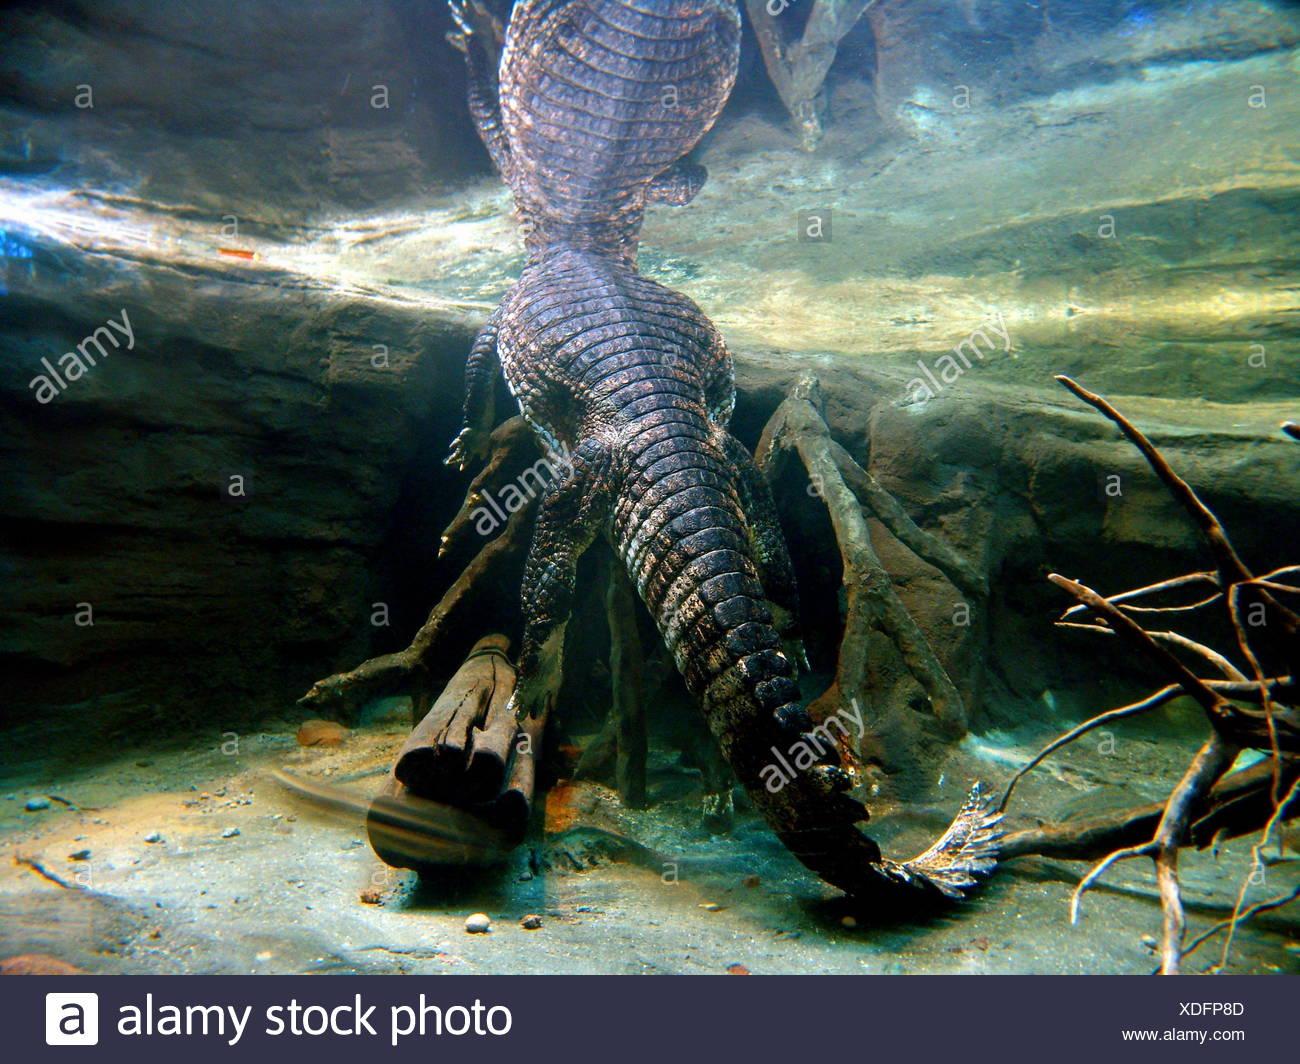 crocodile mirroring tail reptiles water swimming swiming swim swims to do the - Stock Image